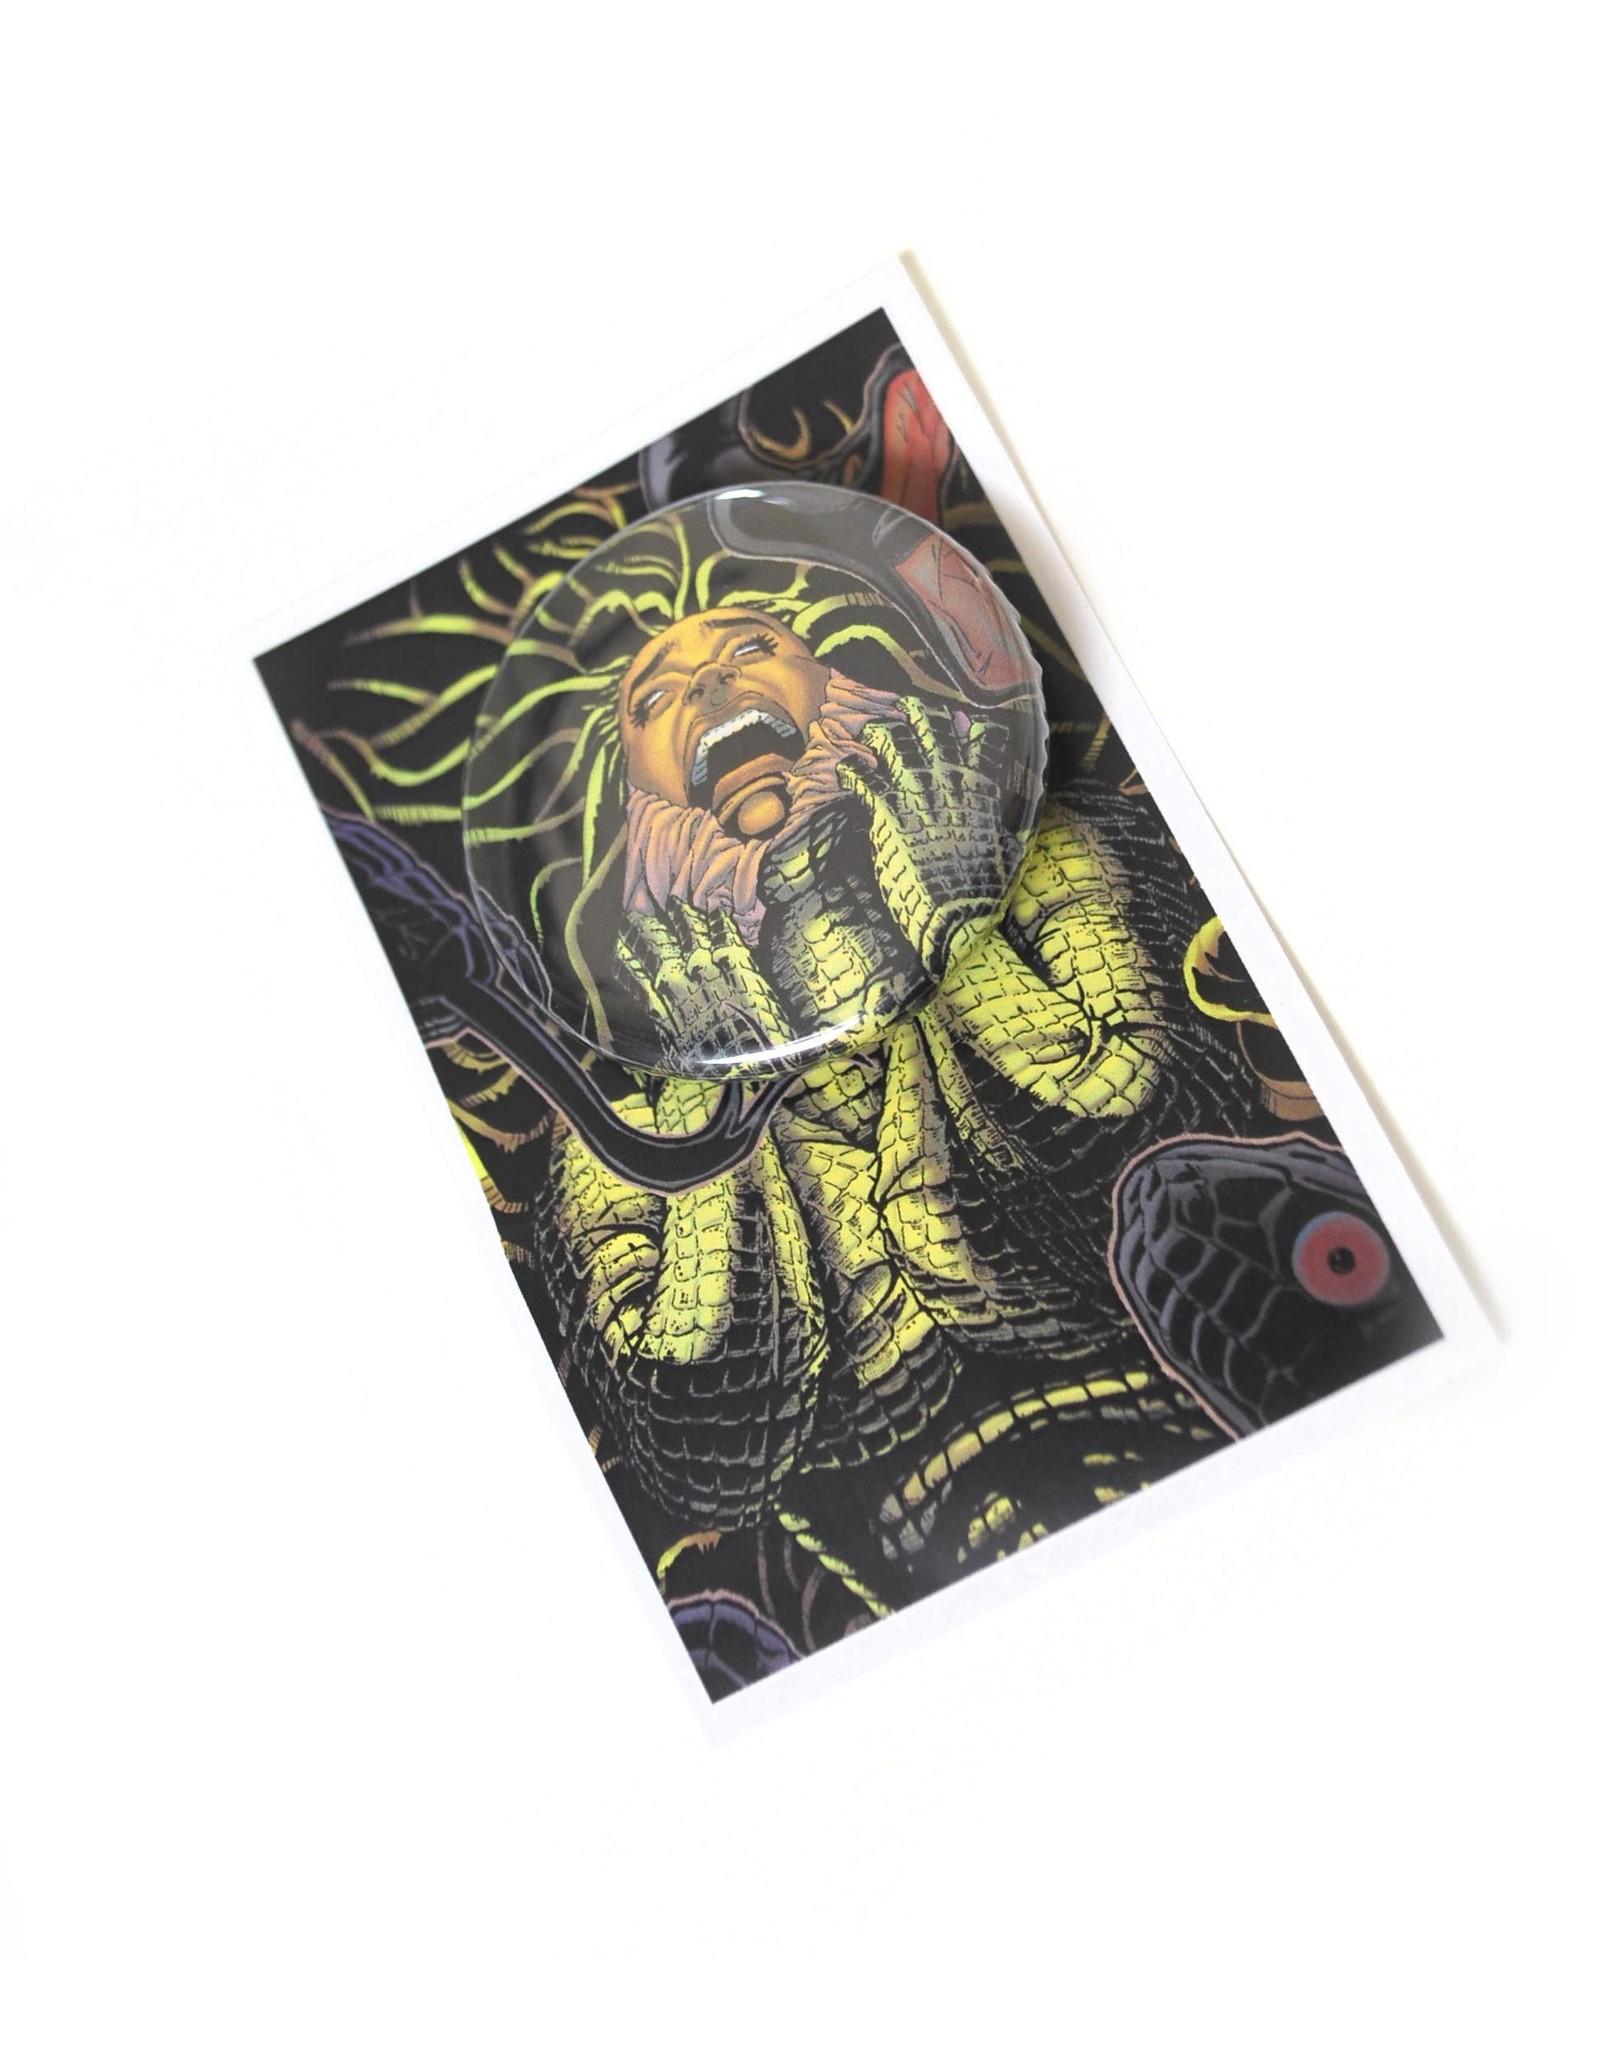 Knight Illustrations Corvus Press Set by David Knight